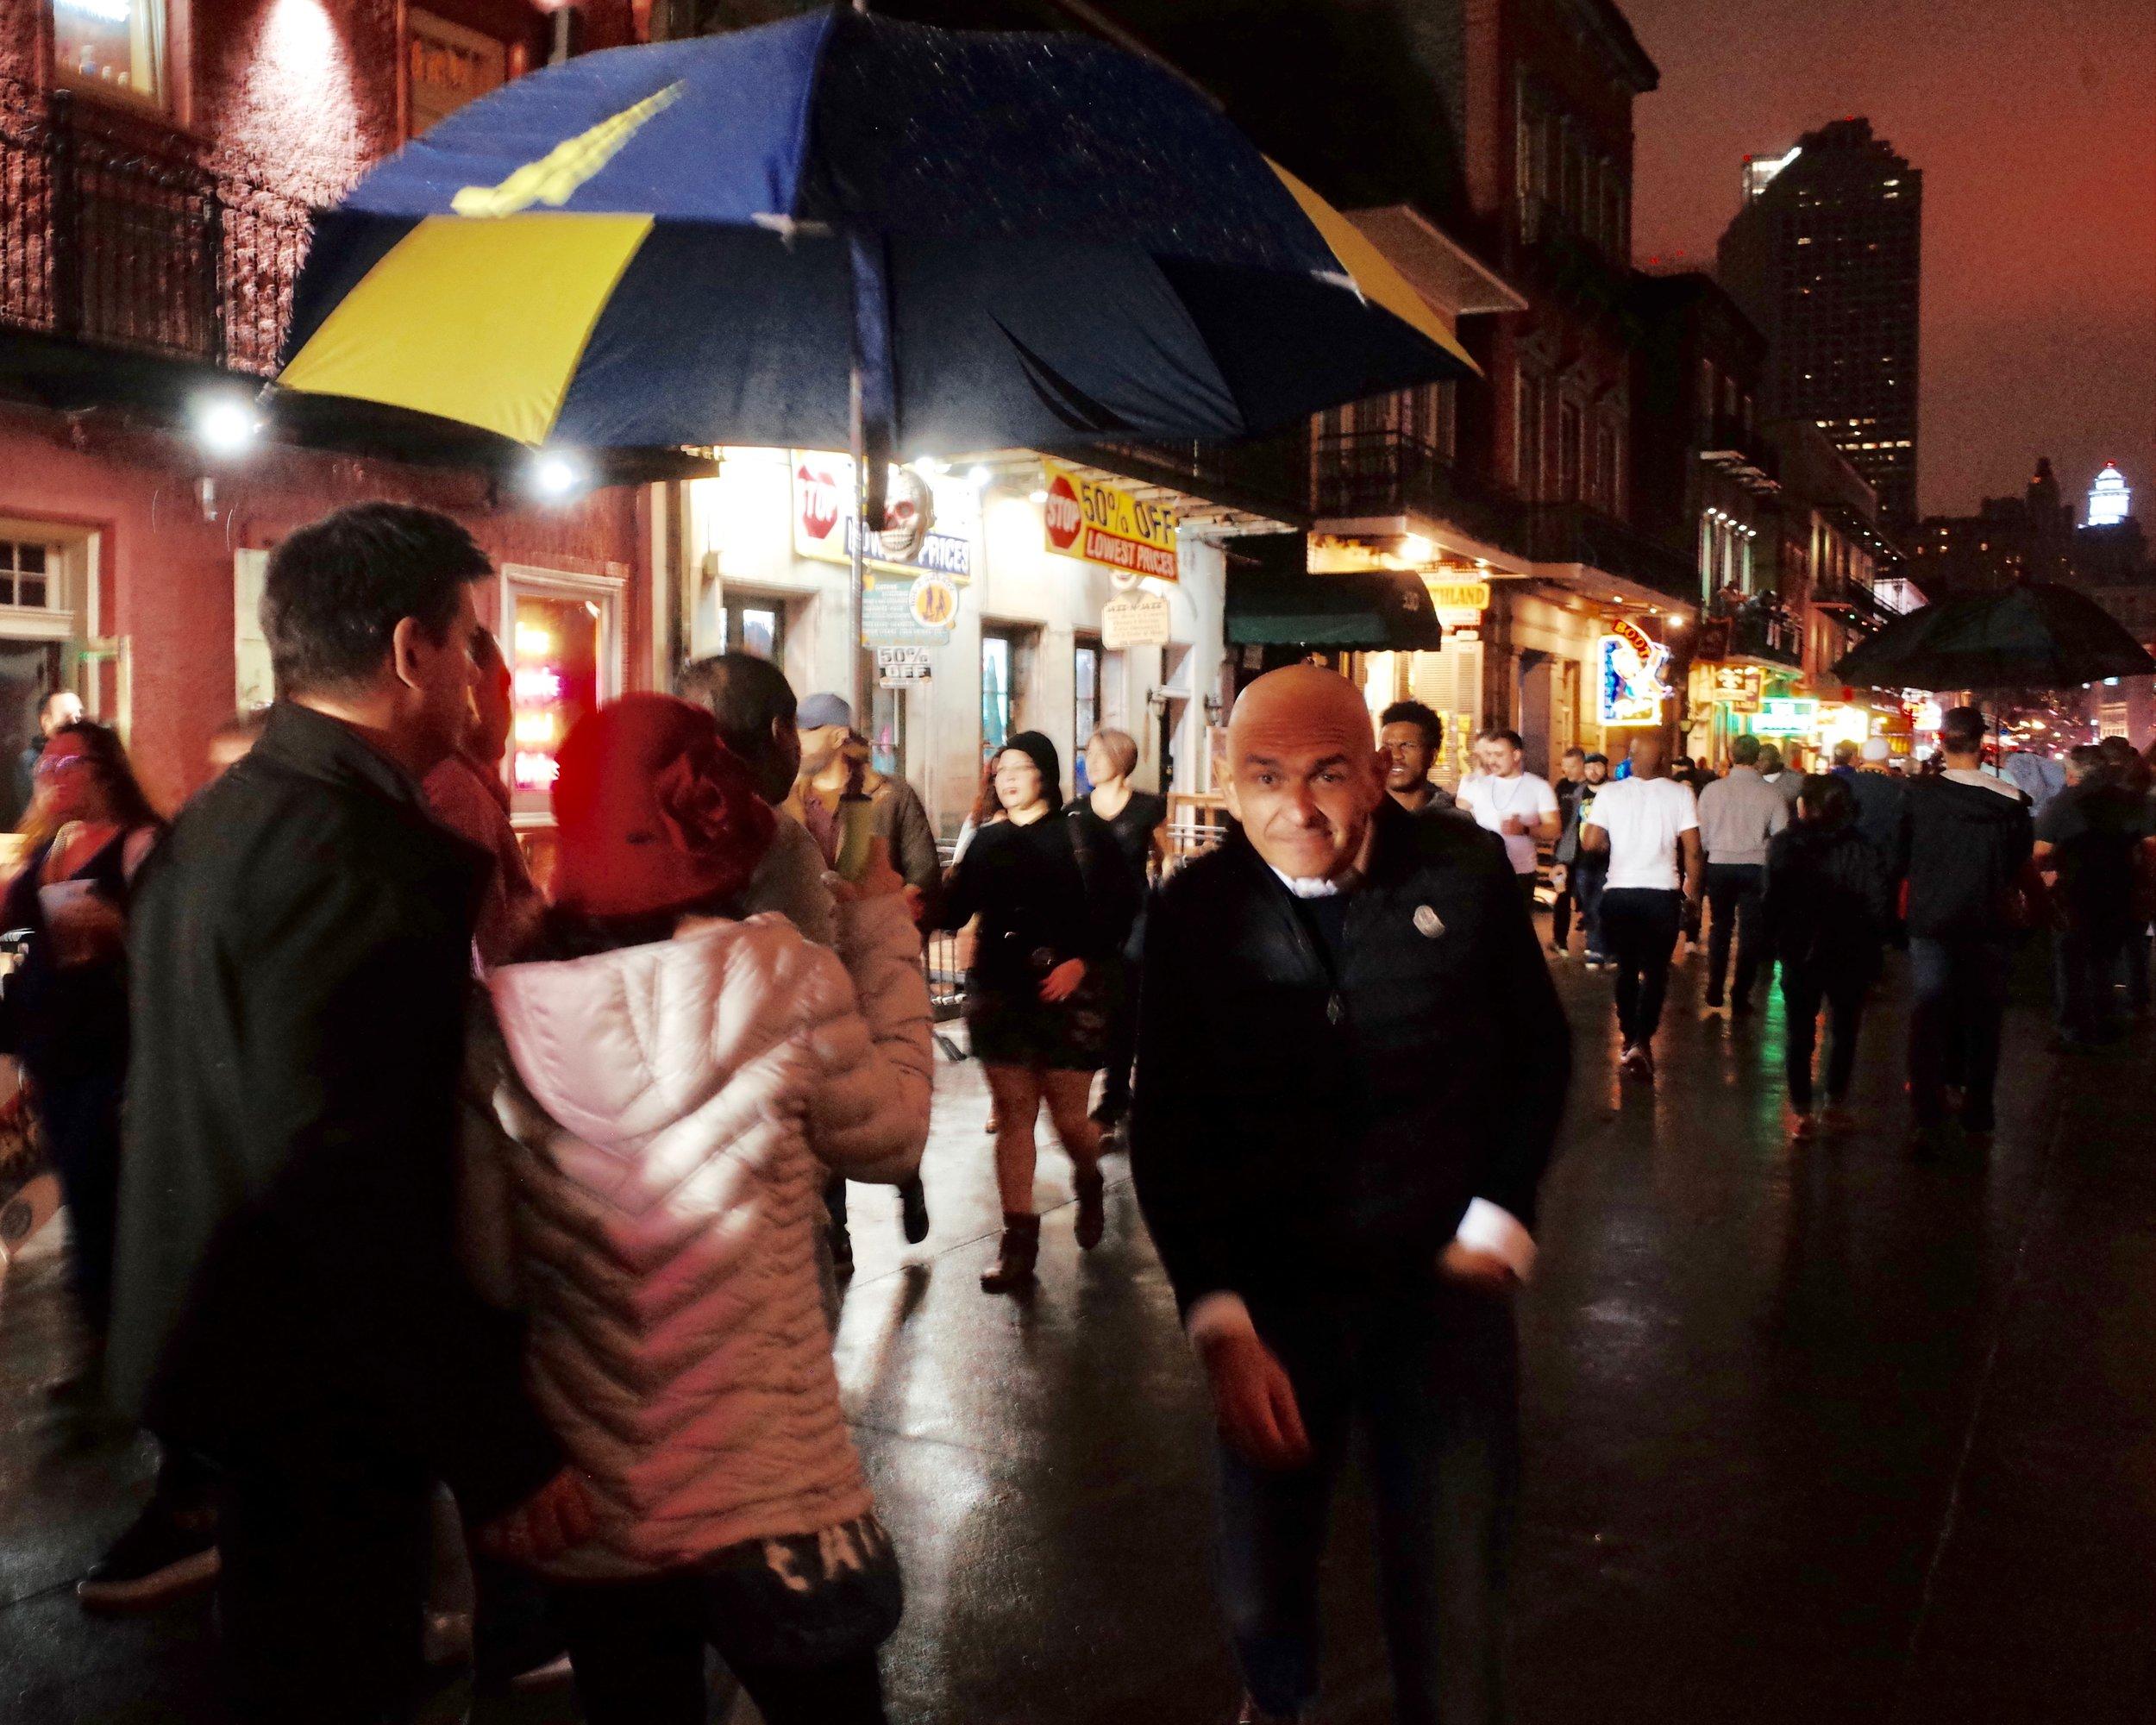 2018-11-30 New Orleans - 9.jpg